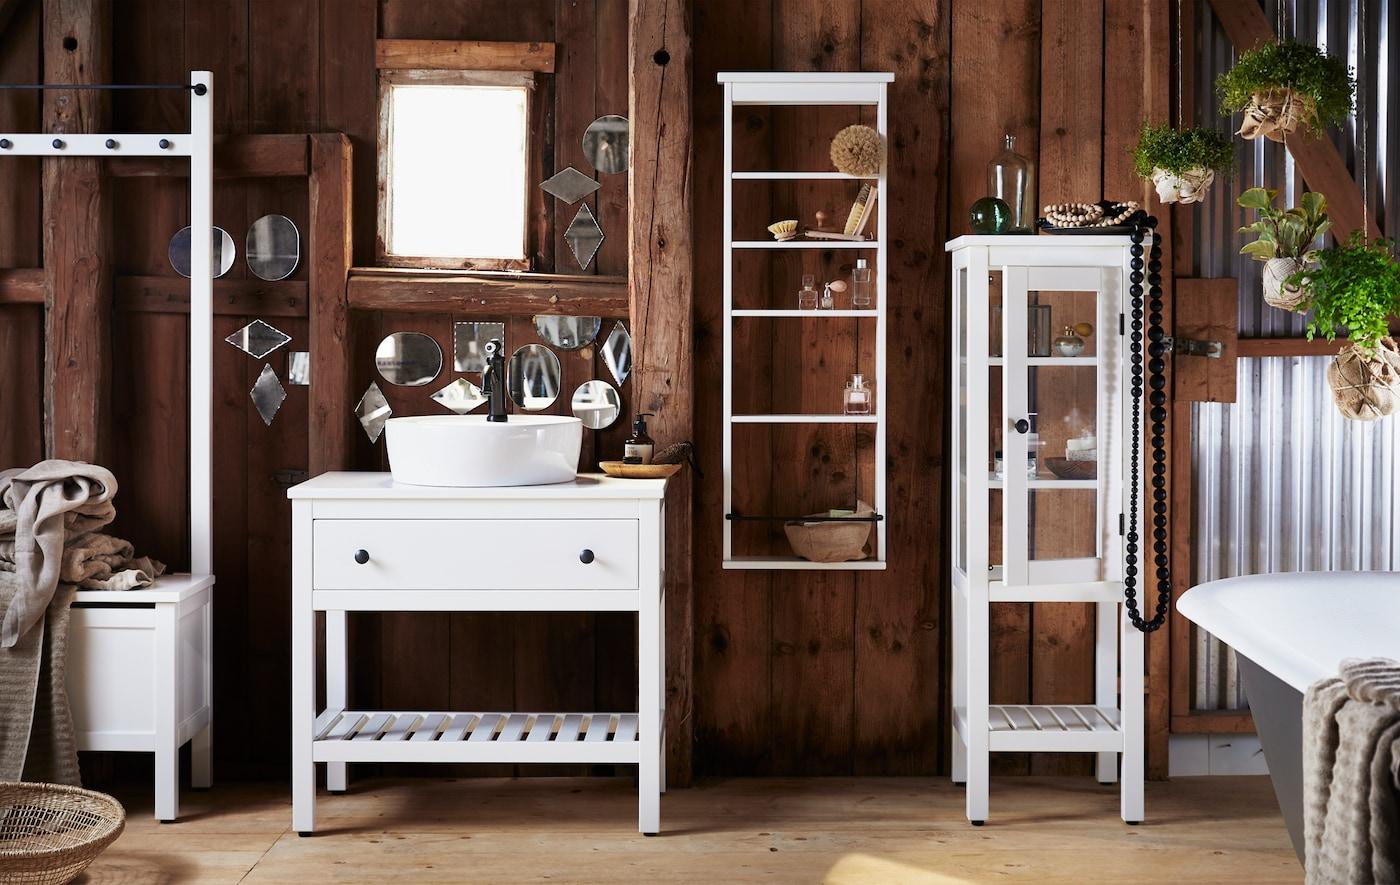 Pied Meuble Salle De Bain Ikea nouveau mobilier de salle de bain hemnes - ikea